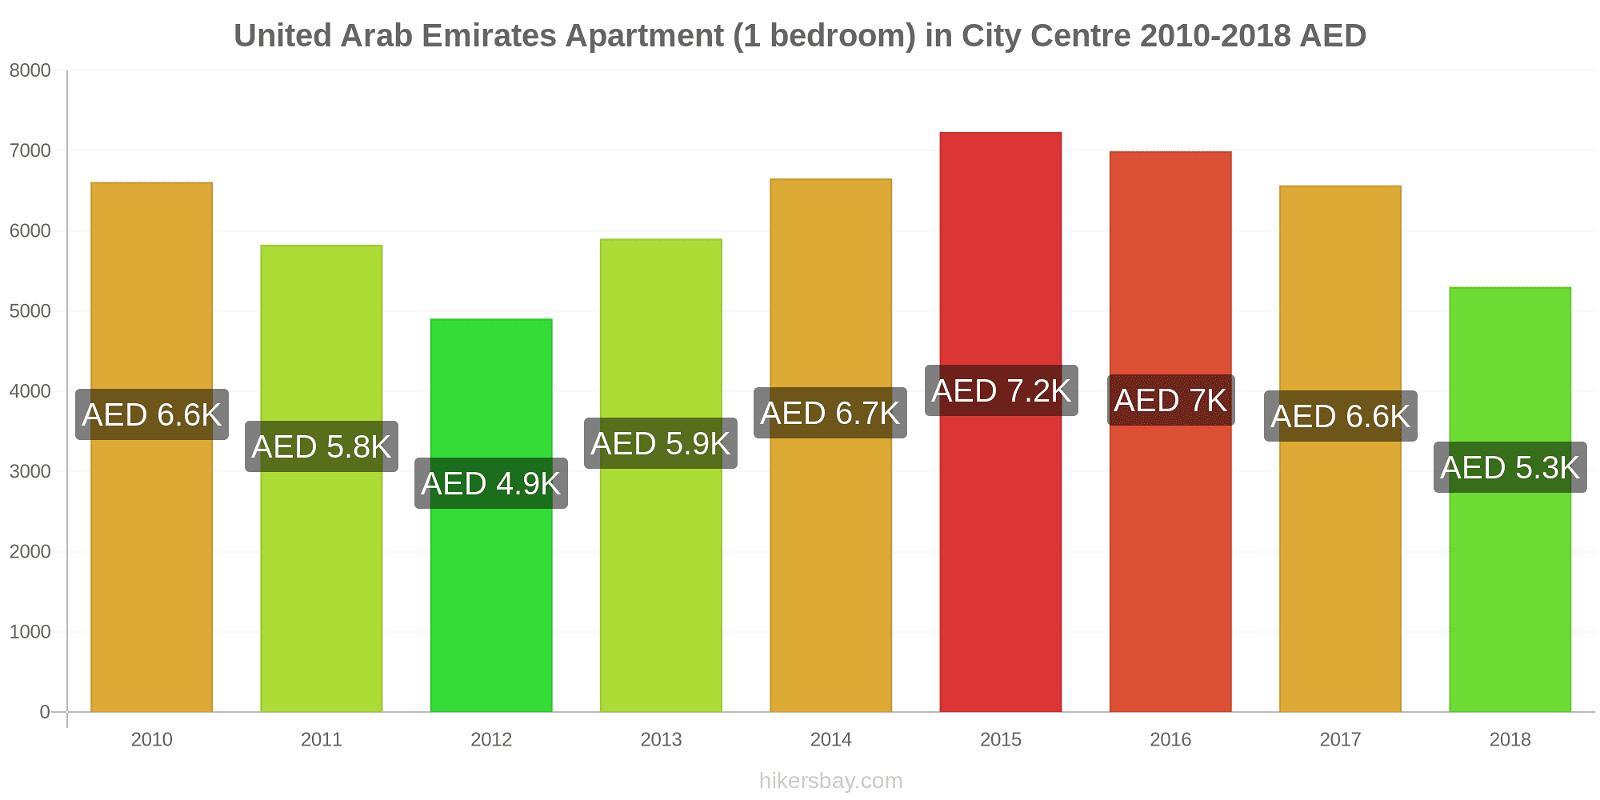 United Arab Emirates price changes Apartment (1 bedroom) in City Centre hikersbay.com